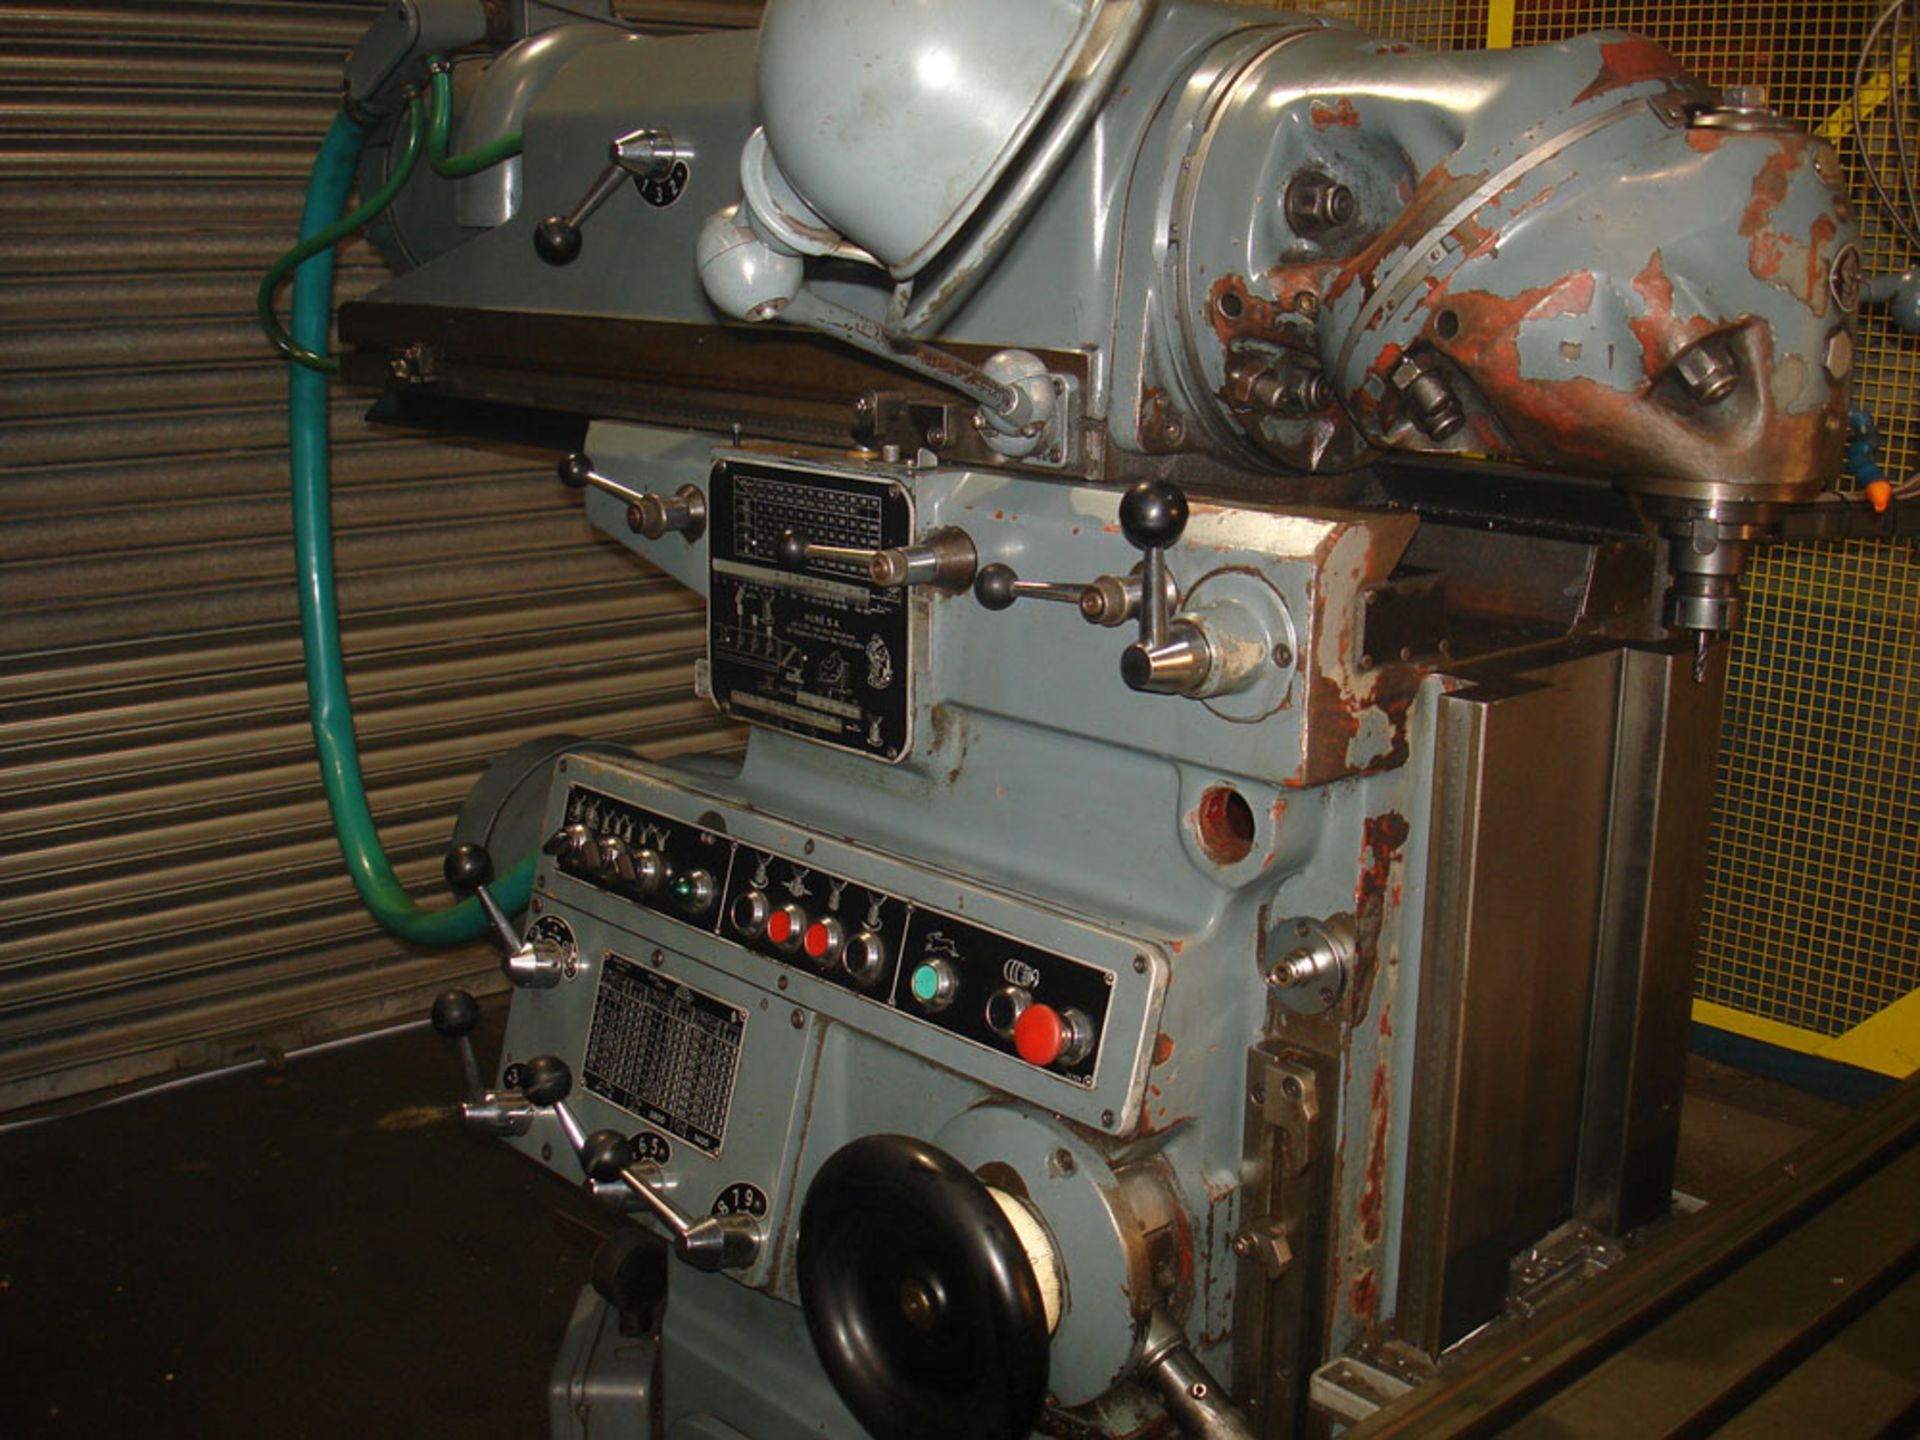 Huron NU5 Universal Milling Machine. Universal Head. Table 1600 x 460 mm. - Image 5 of 7